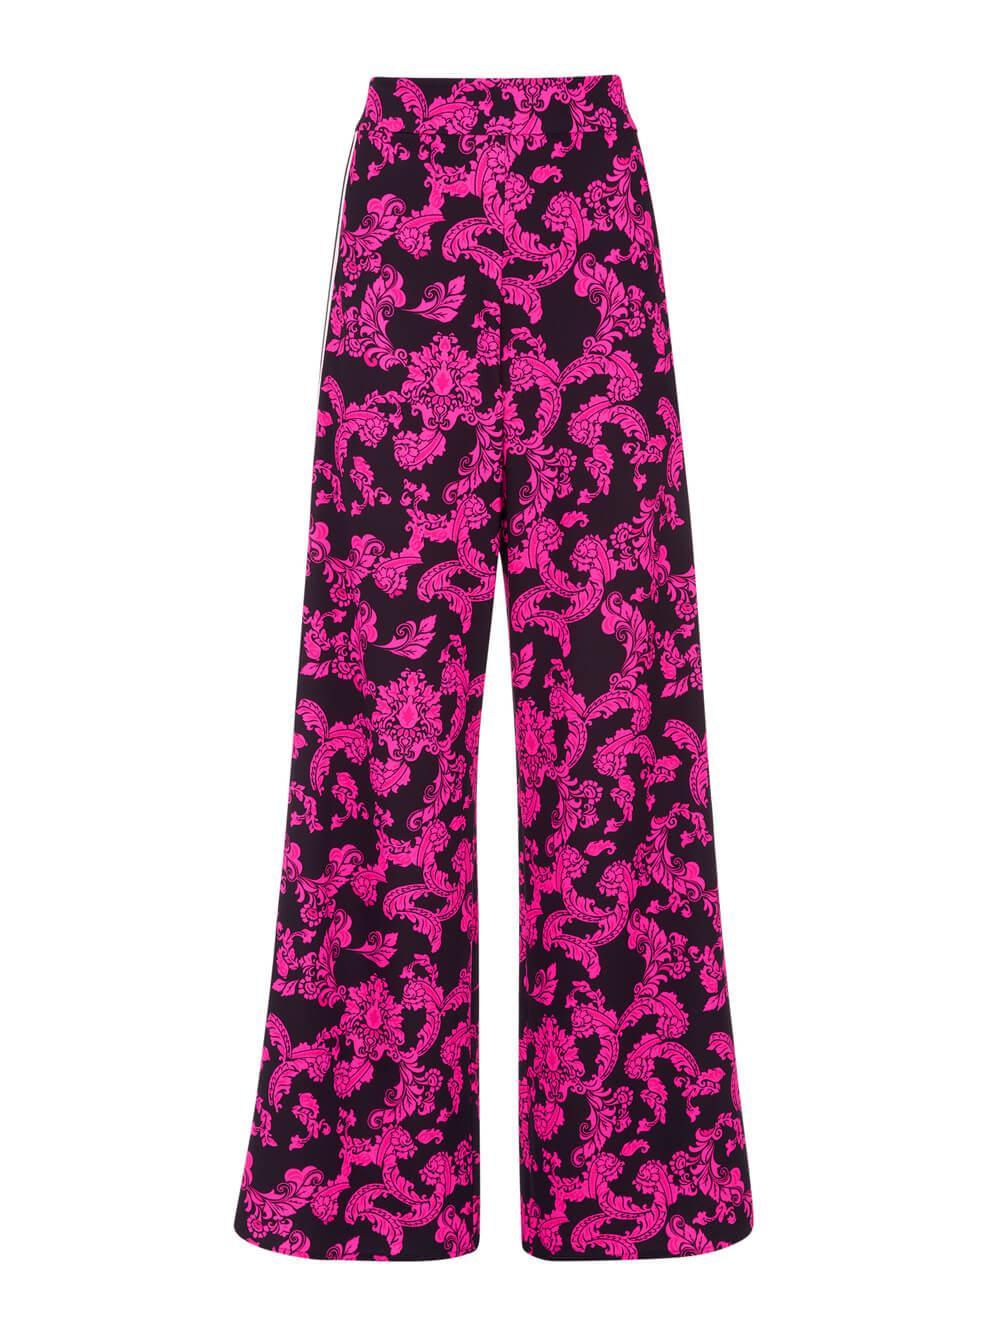 Athena Floral Wide Leg Pants